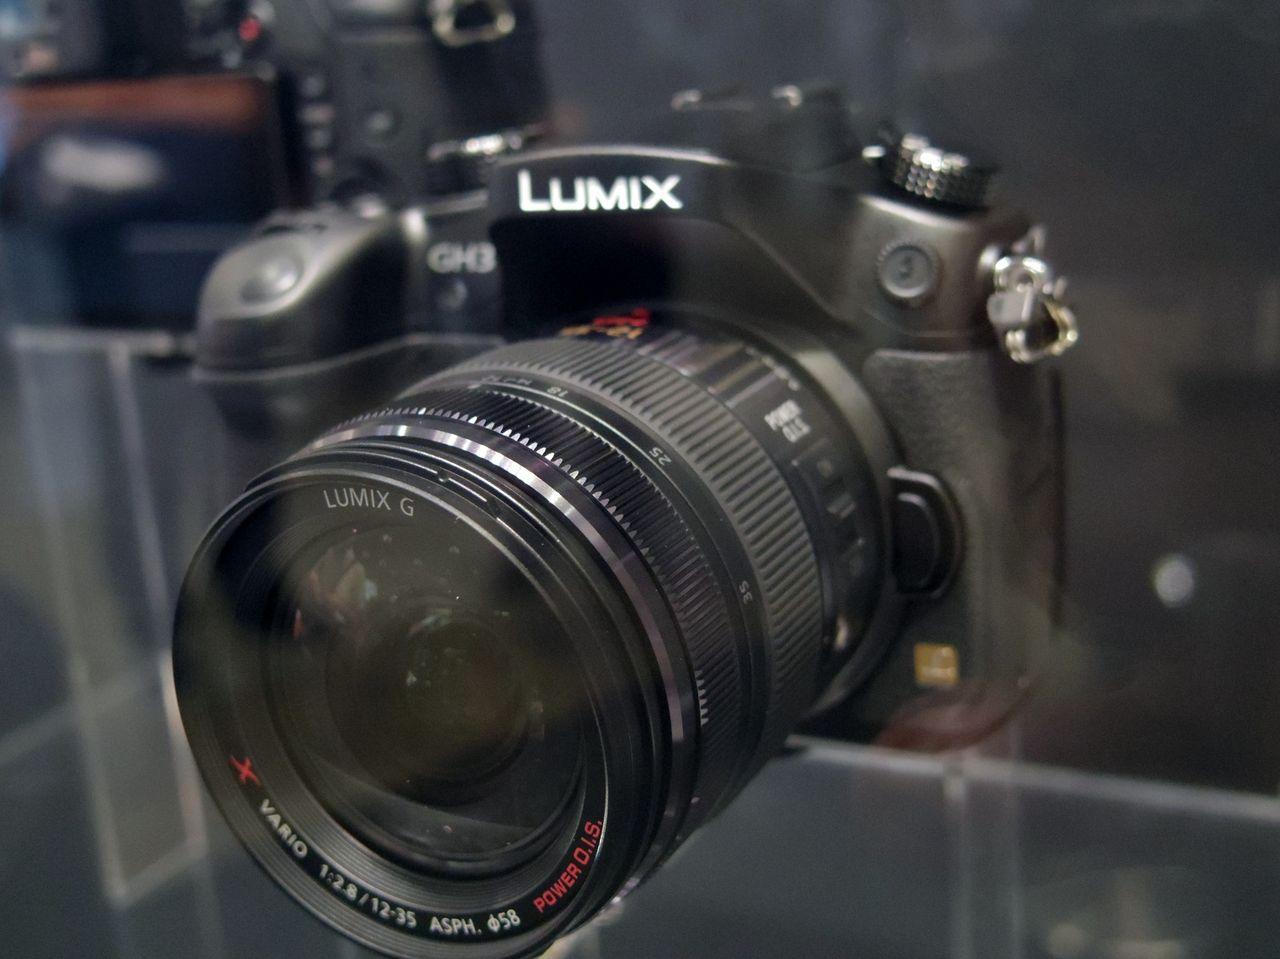 LUMIX DMC-GH3